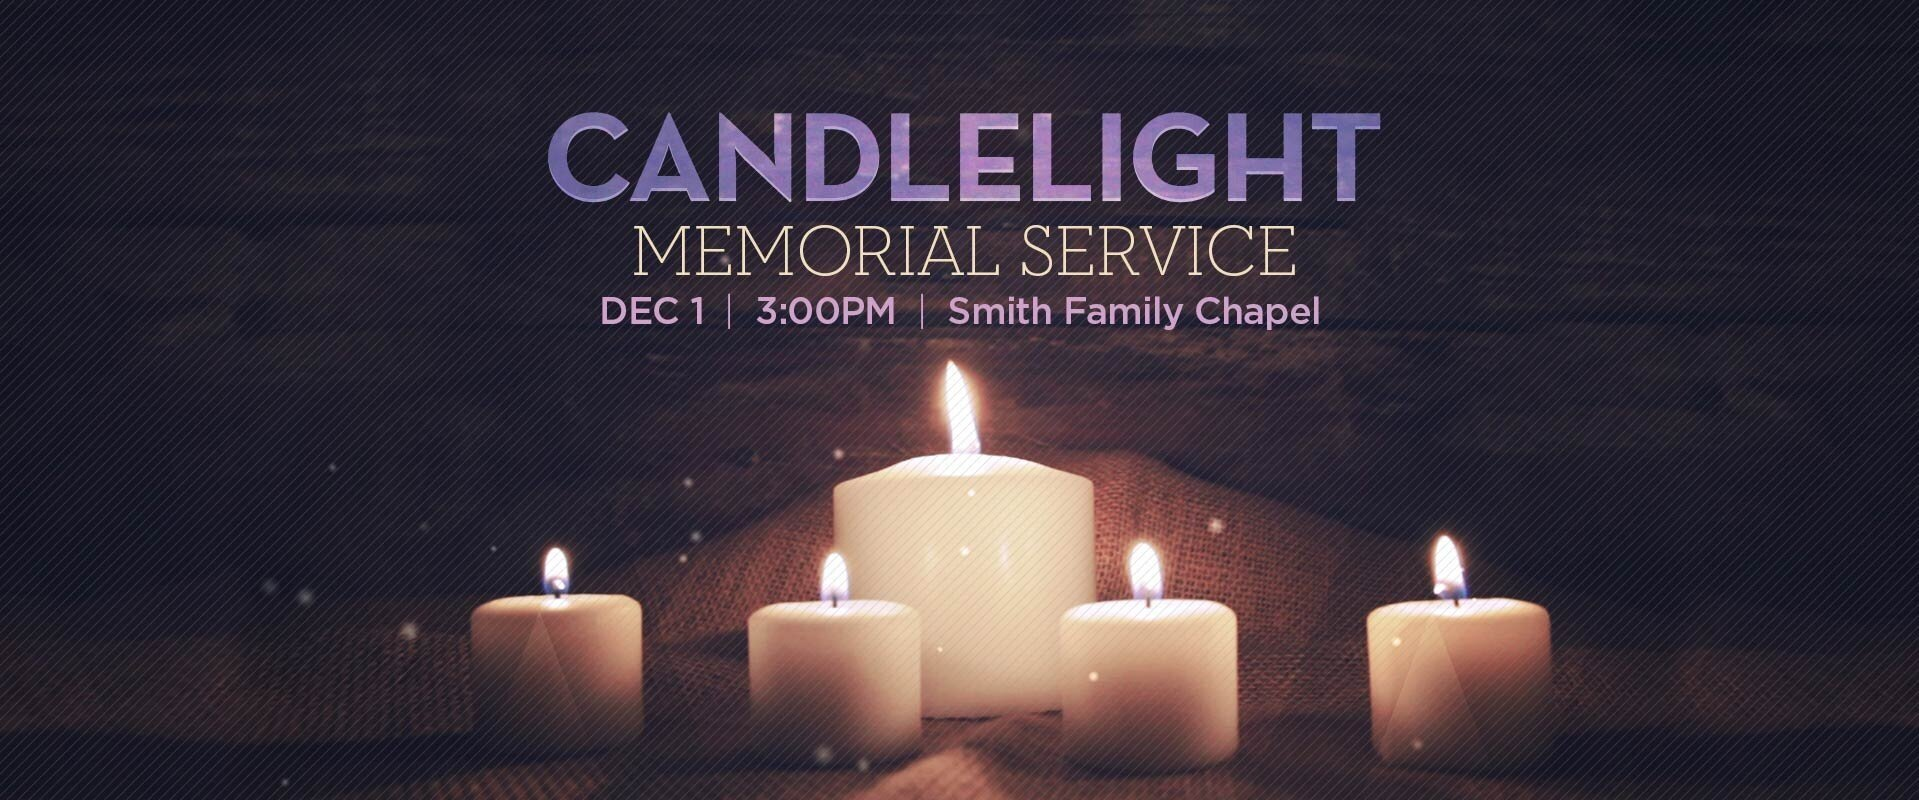 Candlelight-Memorial-Service_1920x800.jpg